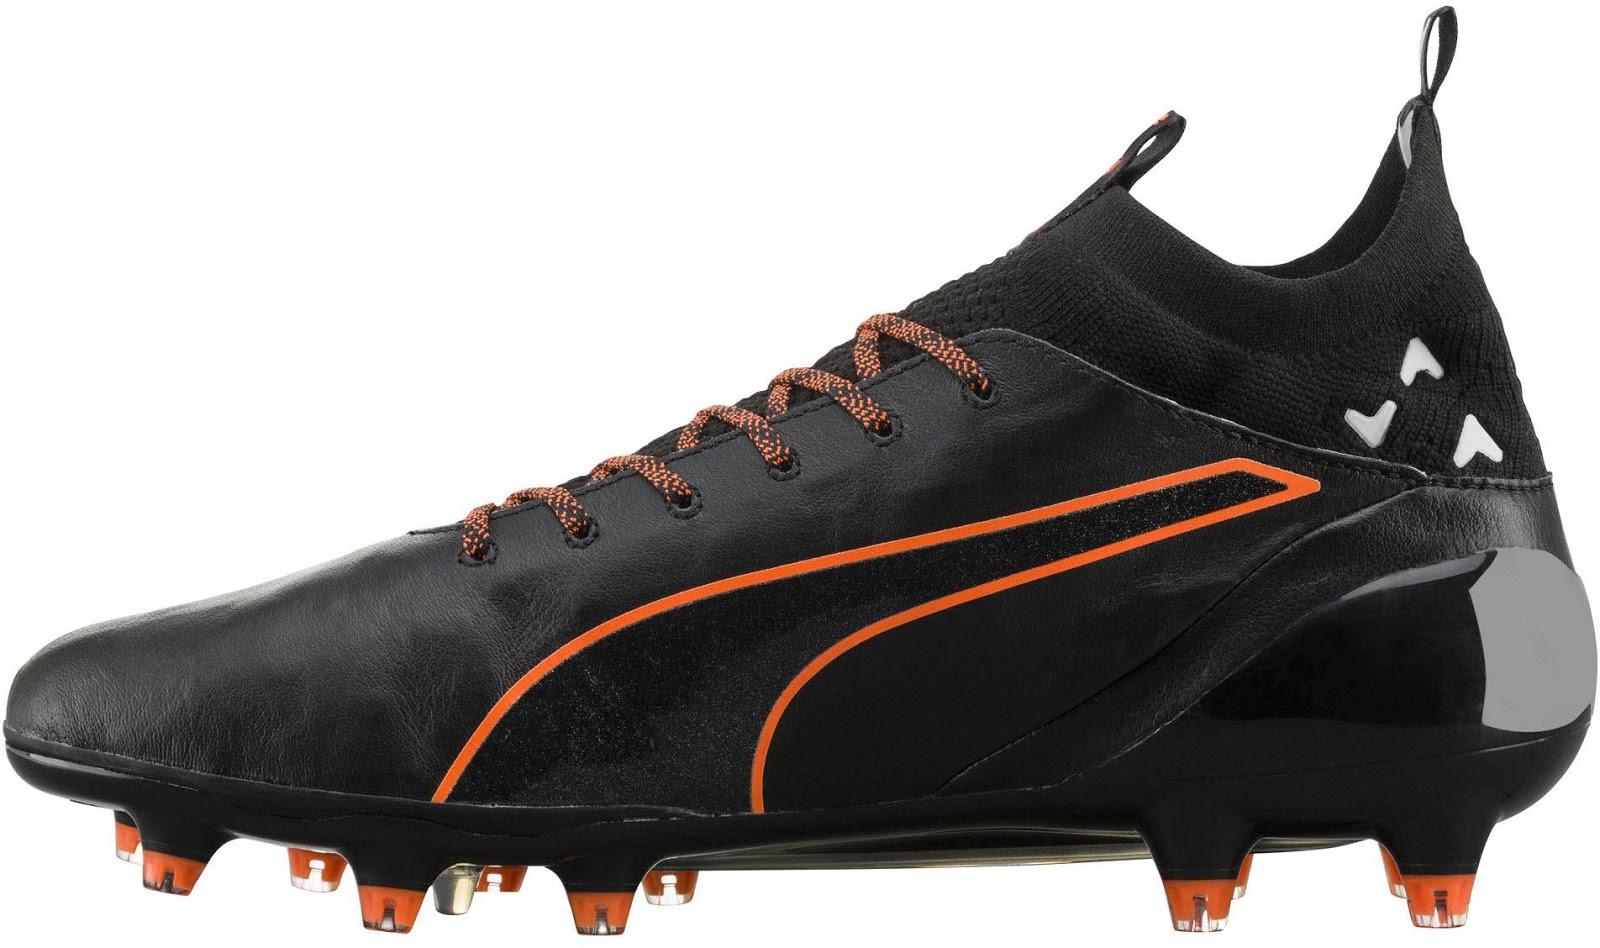 black-orange-puma-evotouch-2016-17-boots full